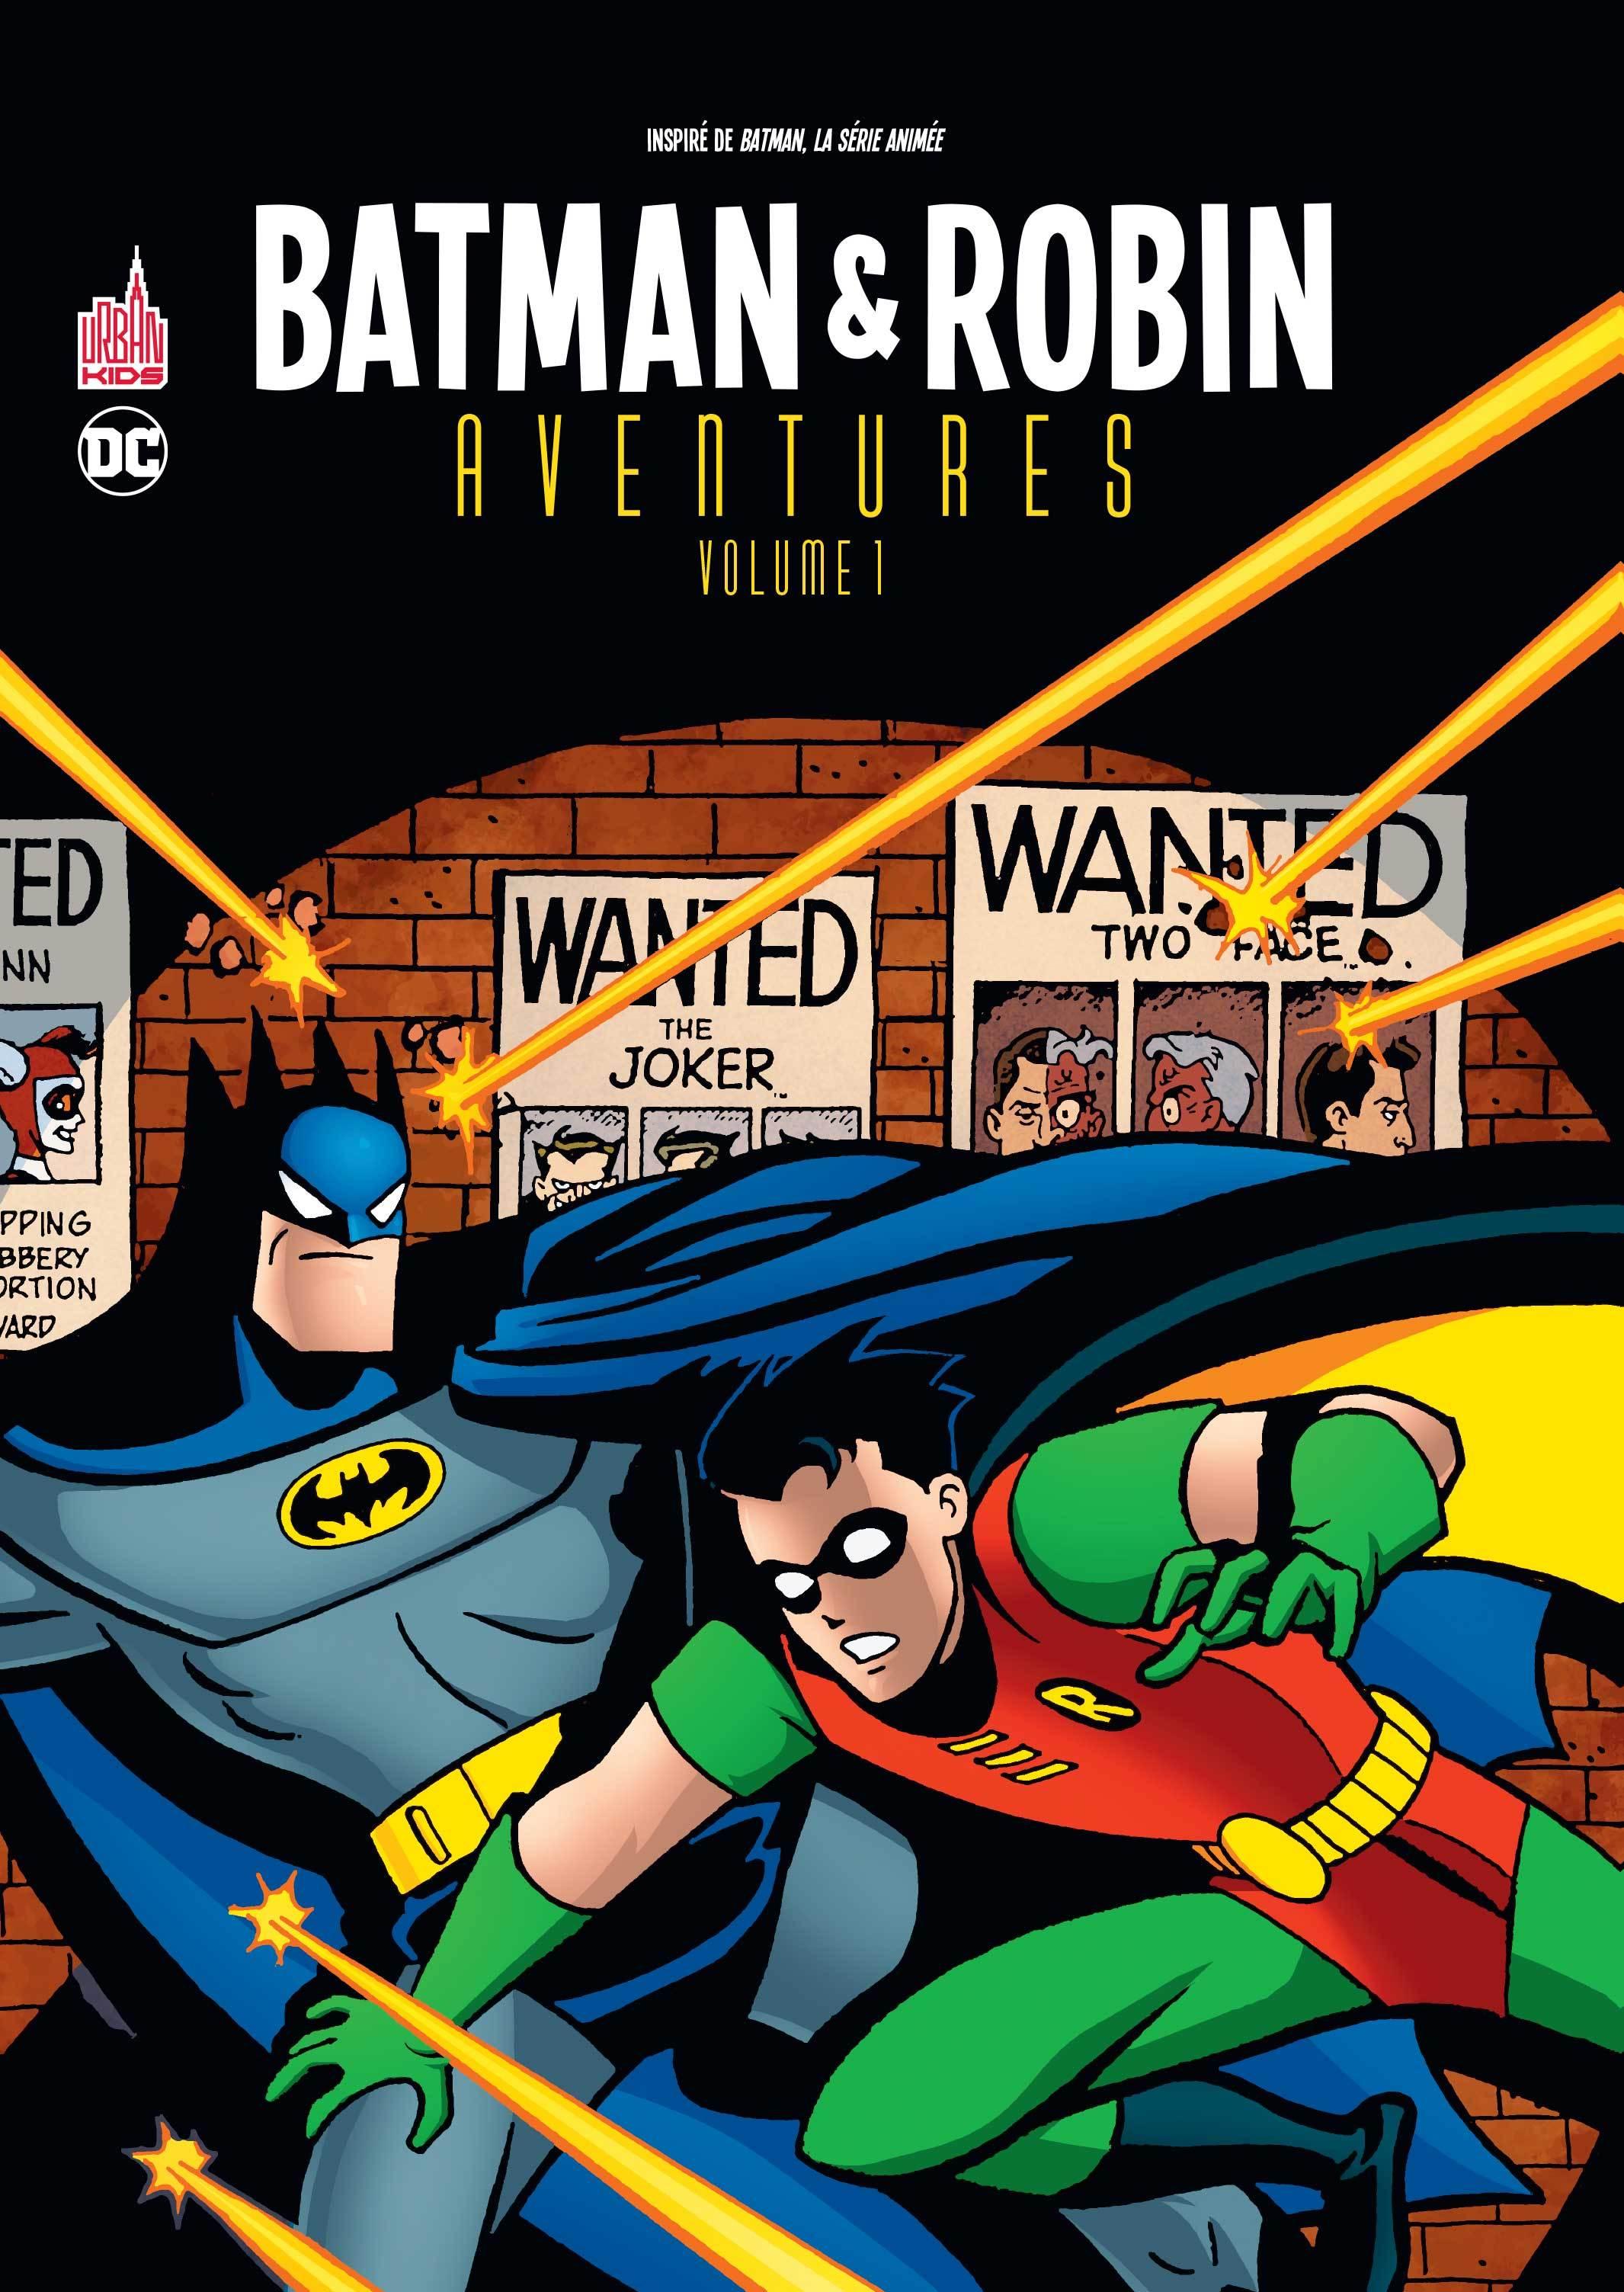 BATMAN & ROBIN AVENTURES TOME 1